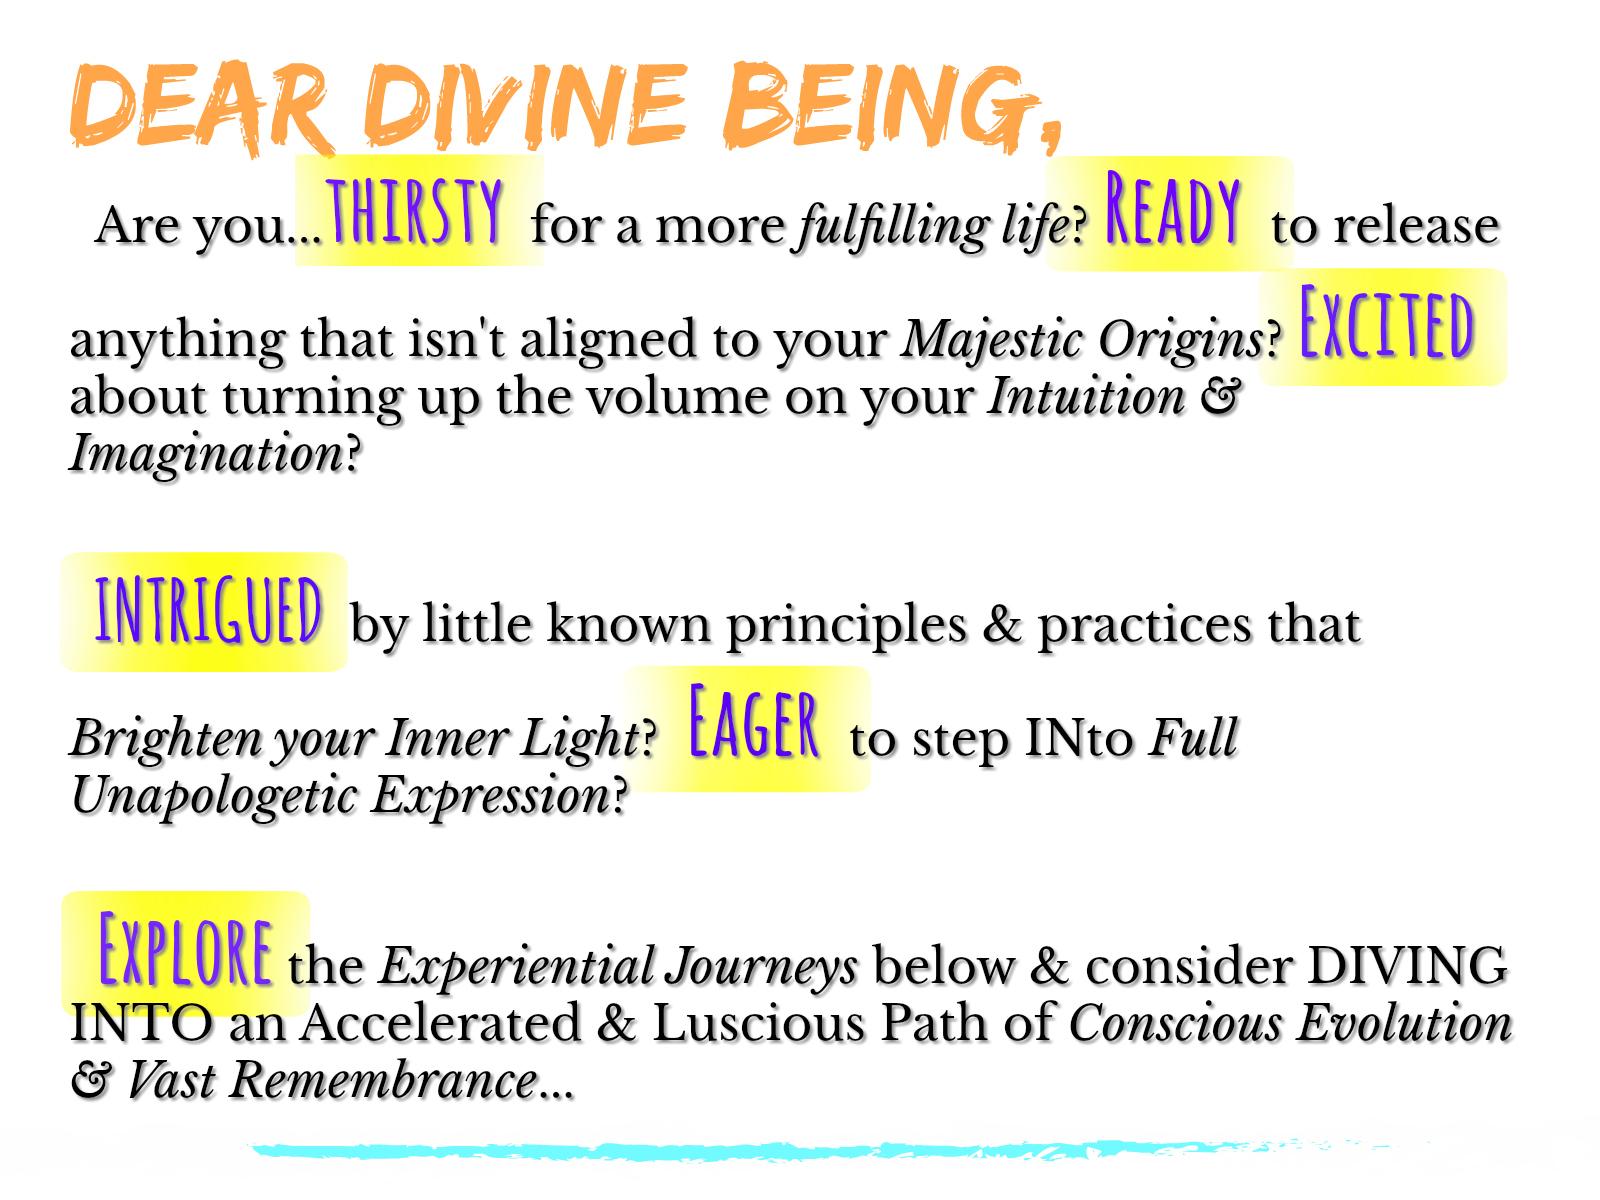 website divine being with line.jpg